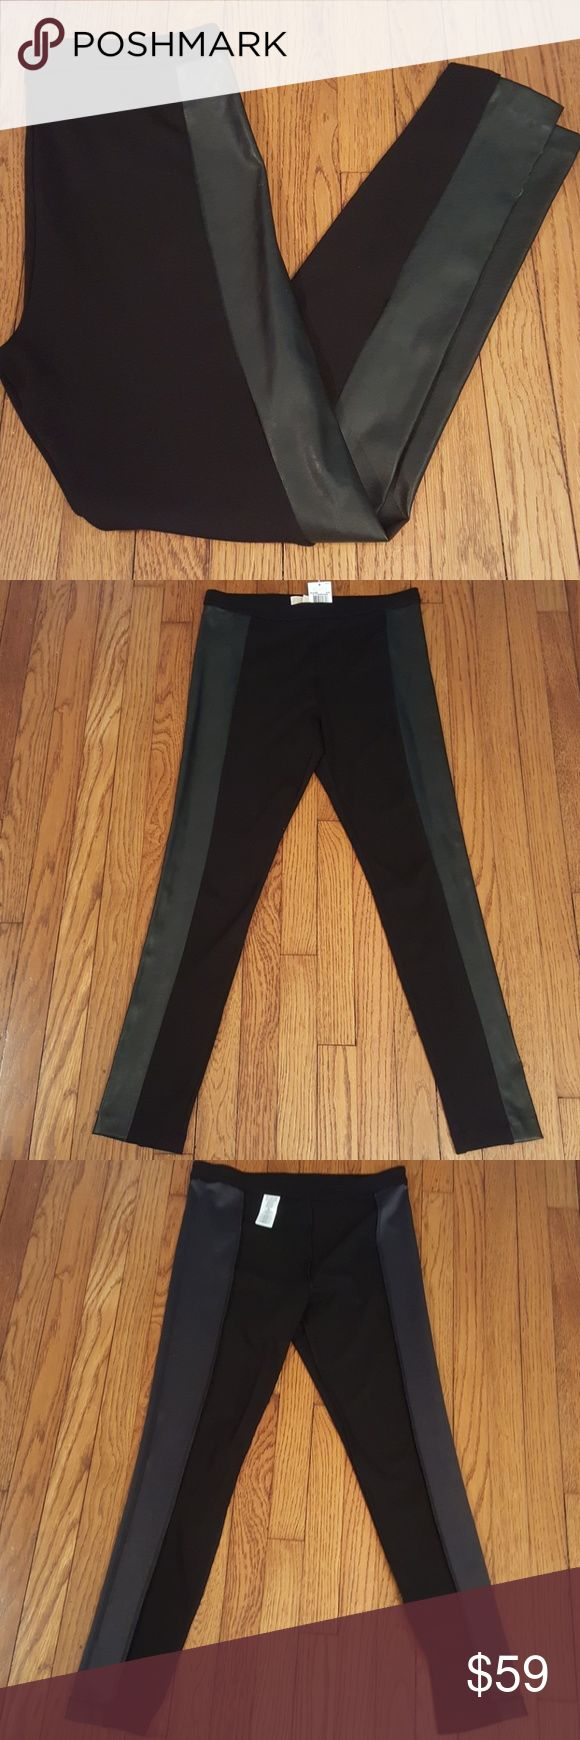 "New Michaal Kors Faux Leather Panel Leggings Super cute with 30"" inseam. MICHAEL Michael Kors Pants Leggings"